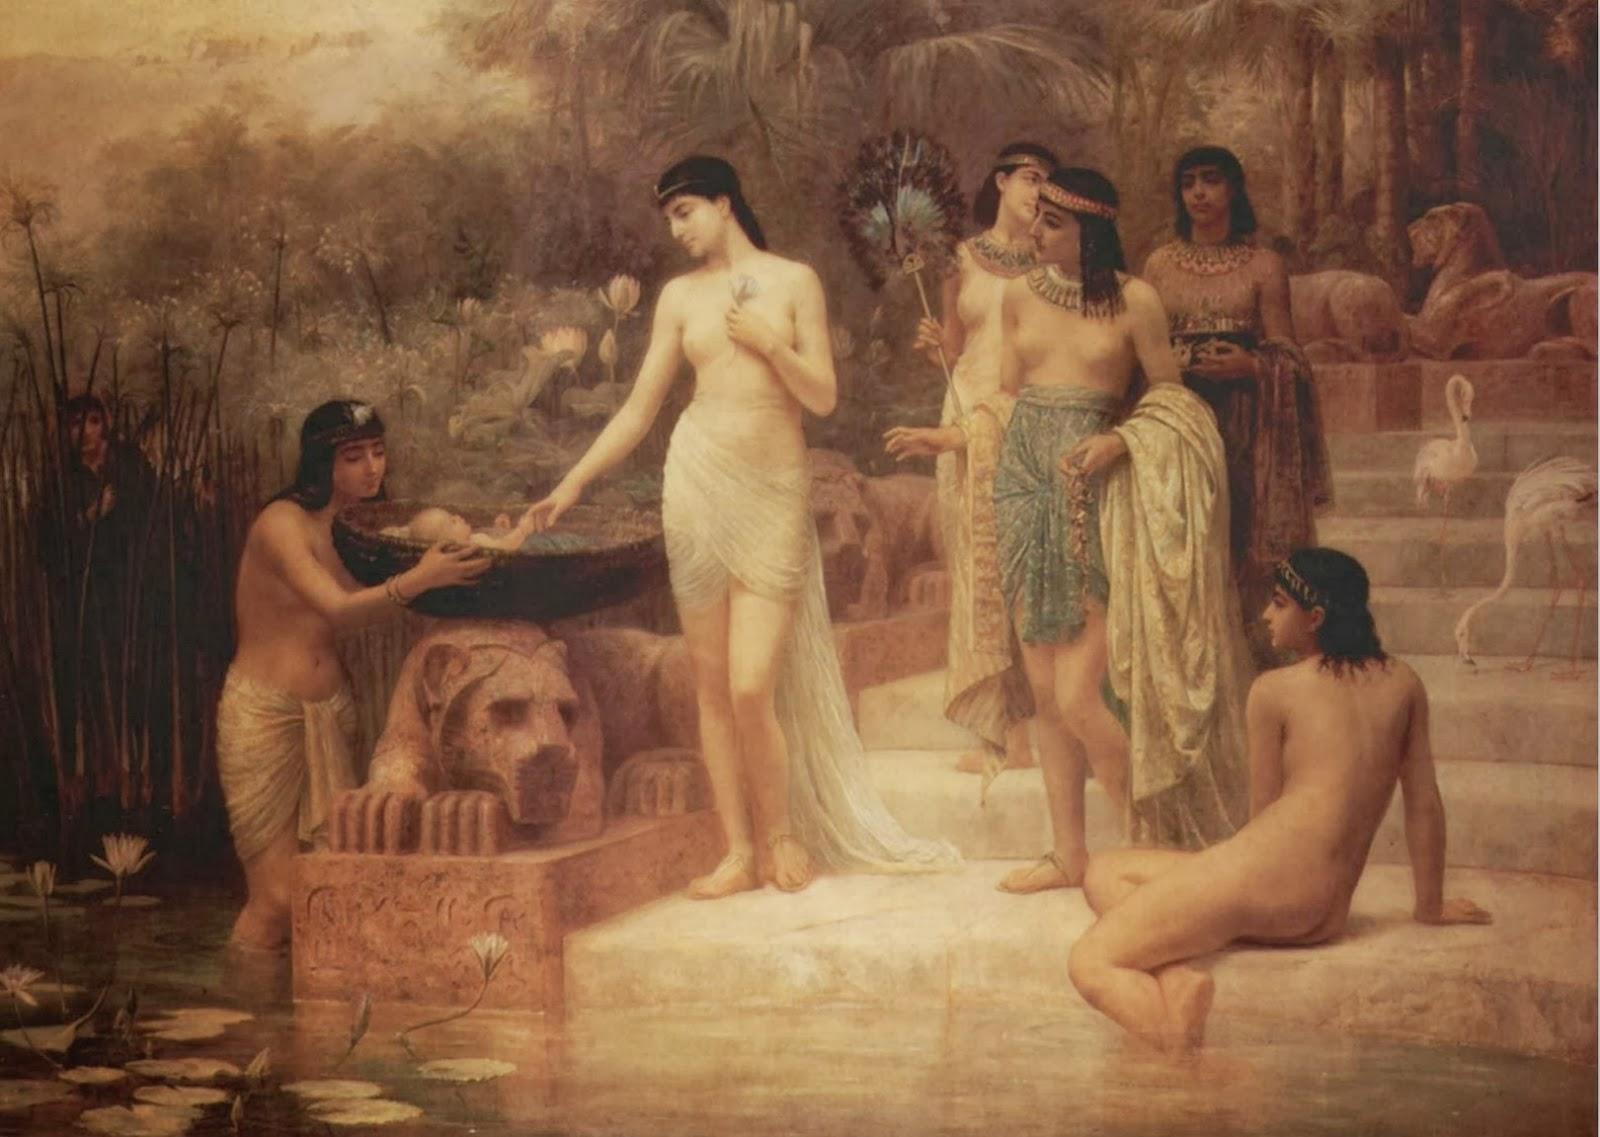 realismo-clasico-pinturas-al-oleo